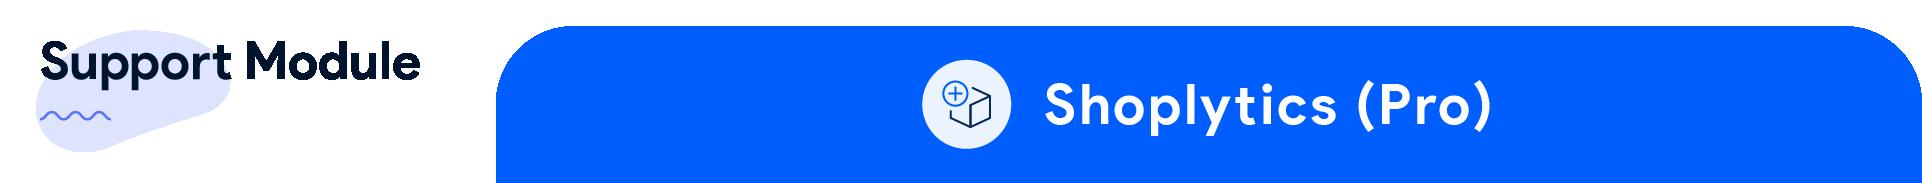 6.All_EN_Shoplytics-Pro.png